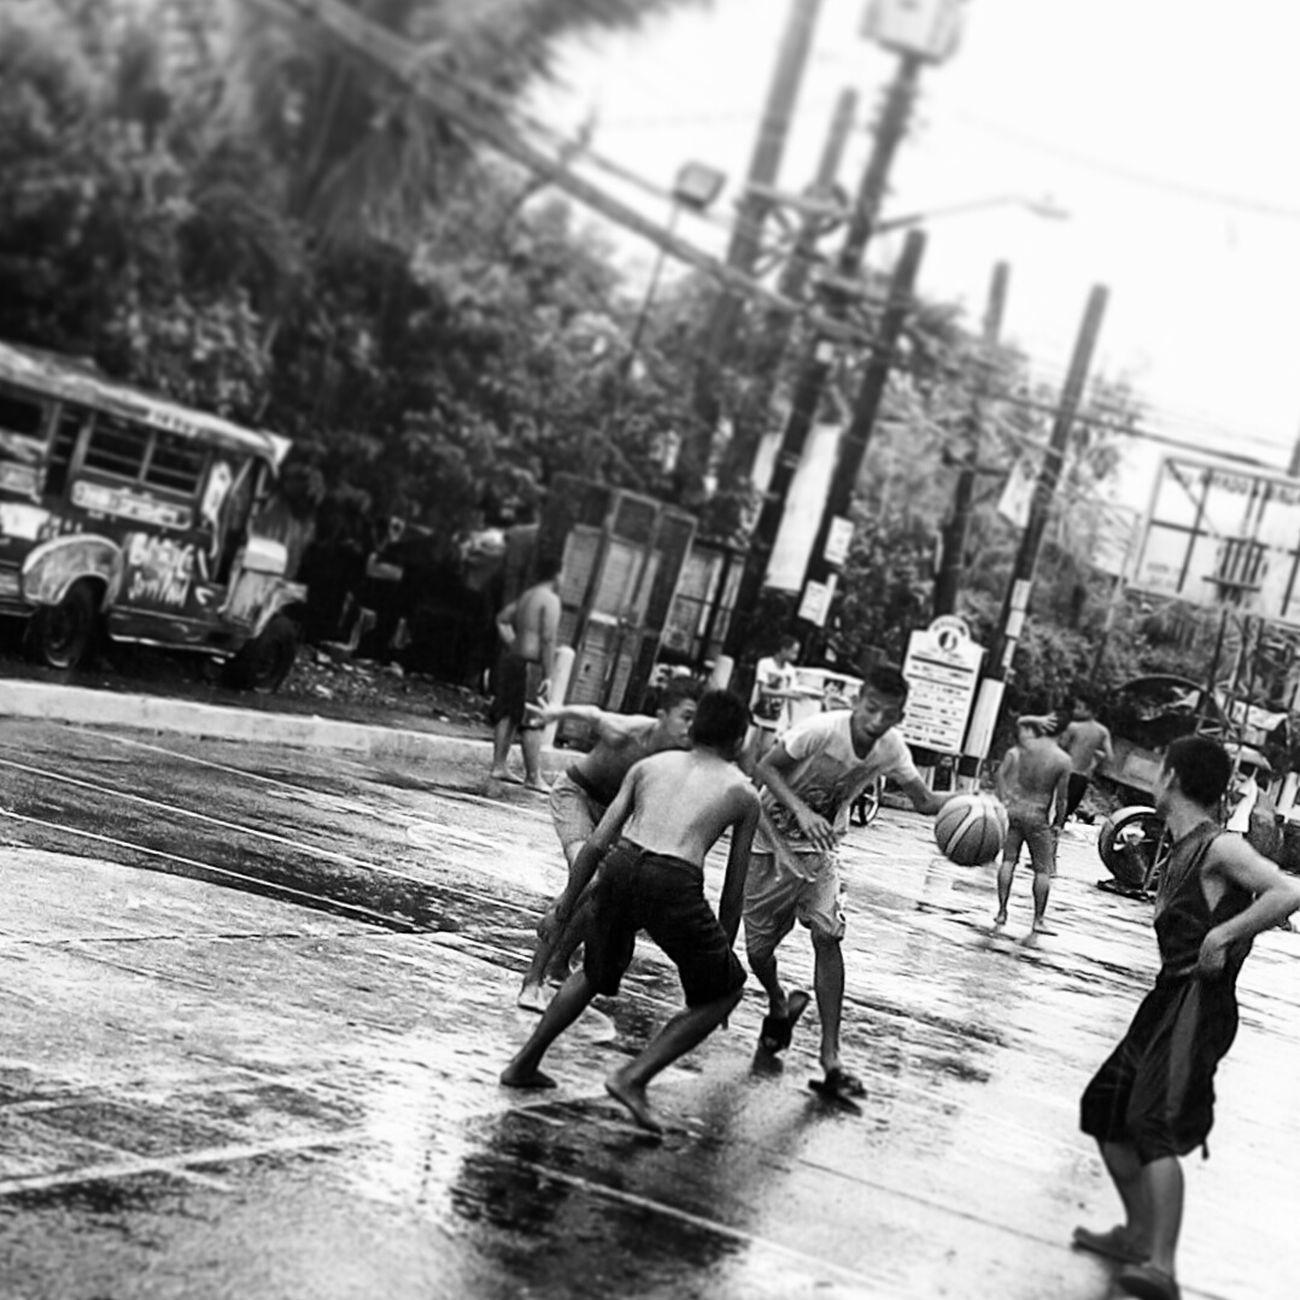 These boys don't mind the pouring rain. Blackandwhite Streetphotography Streetphoto_bw The Street Photographer - 2015 EyeEm AwardsEeyem Photography Eyeem Philippines Rainy Days Streetbasketball Sports Photography Mobile Photography